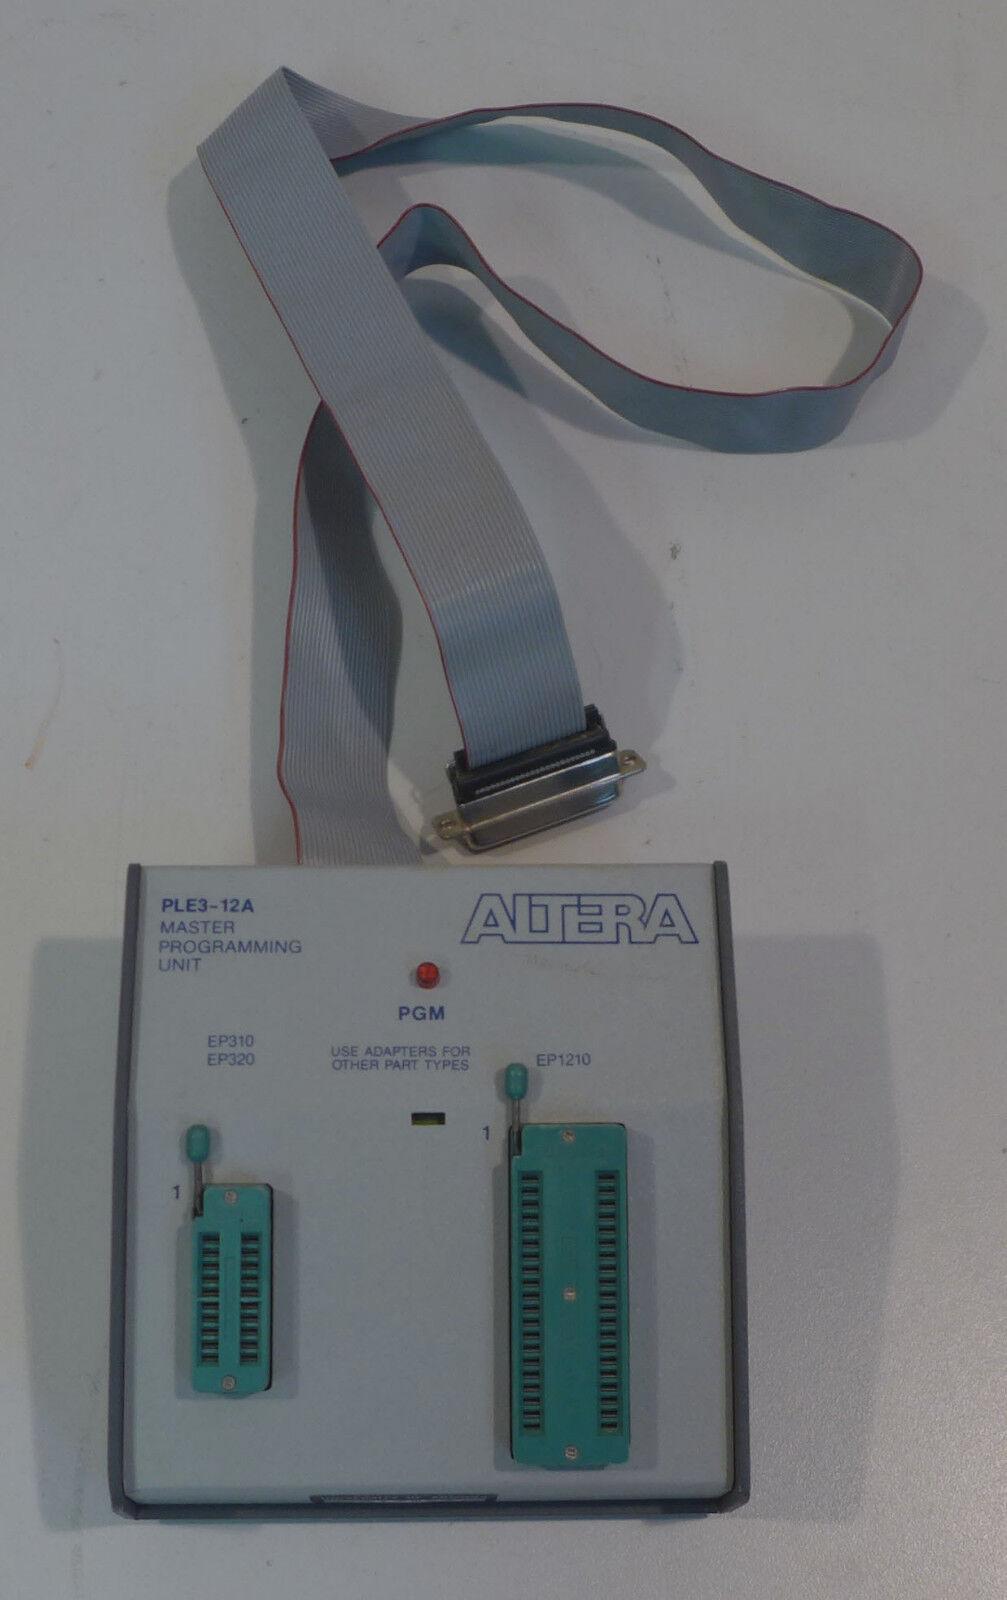 Altera Ple3-12a Master Programming Unit With Pleg1800 Adaptor